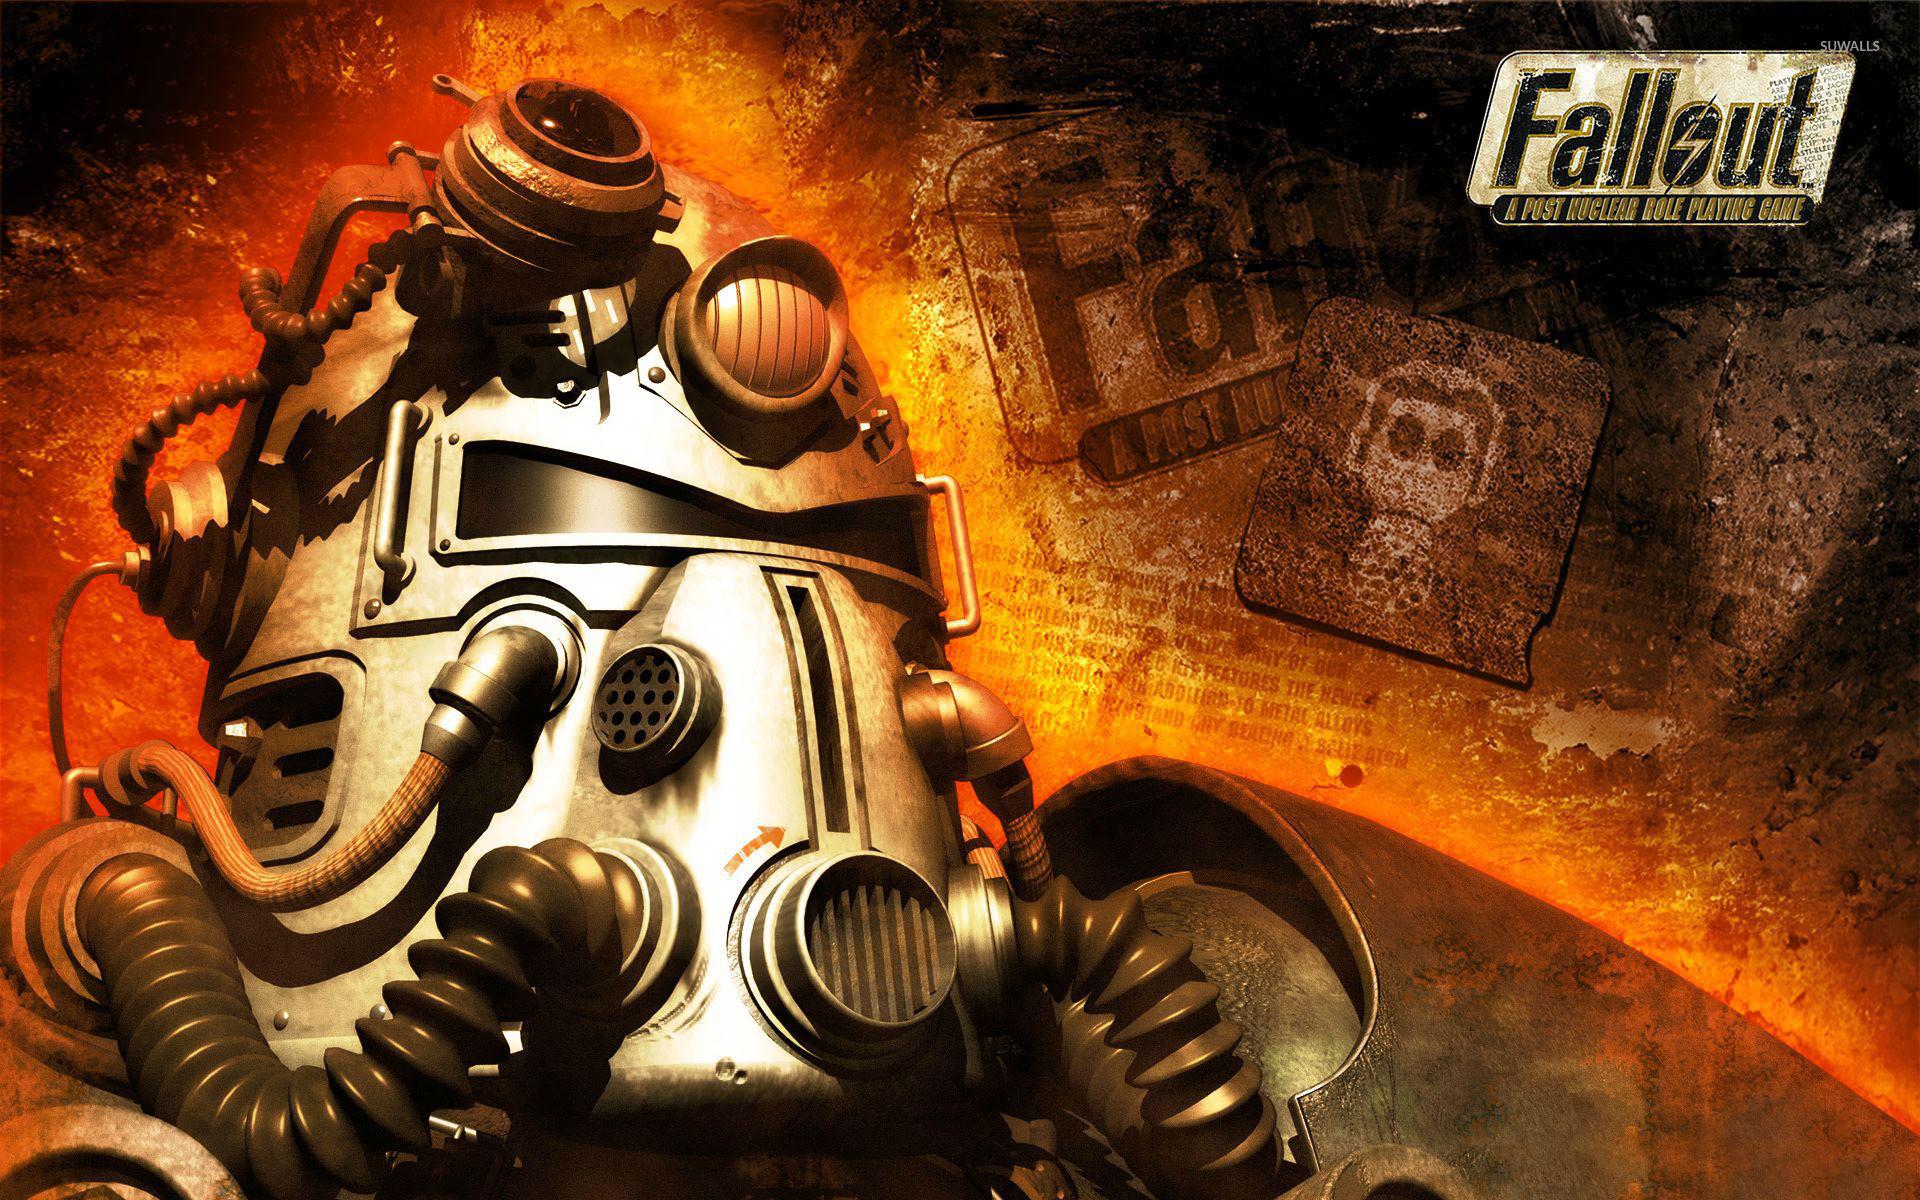 Fallout: New Vegas [6] wallpaper – Game wallpapers – #15040